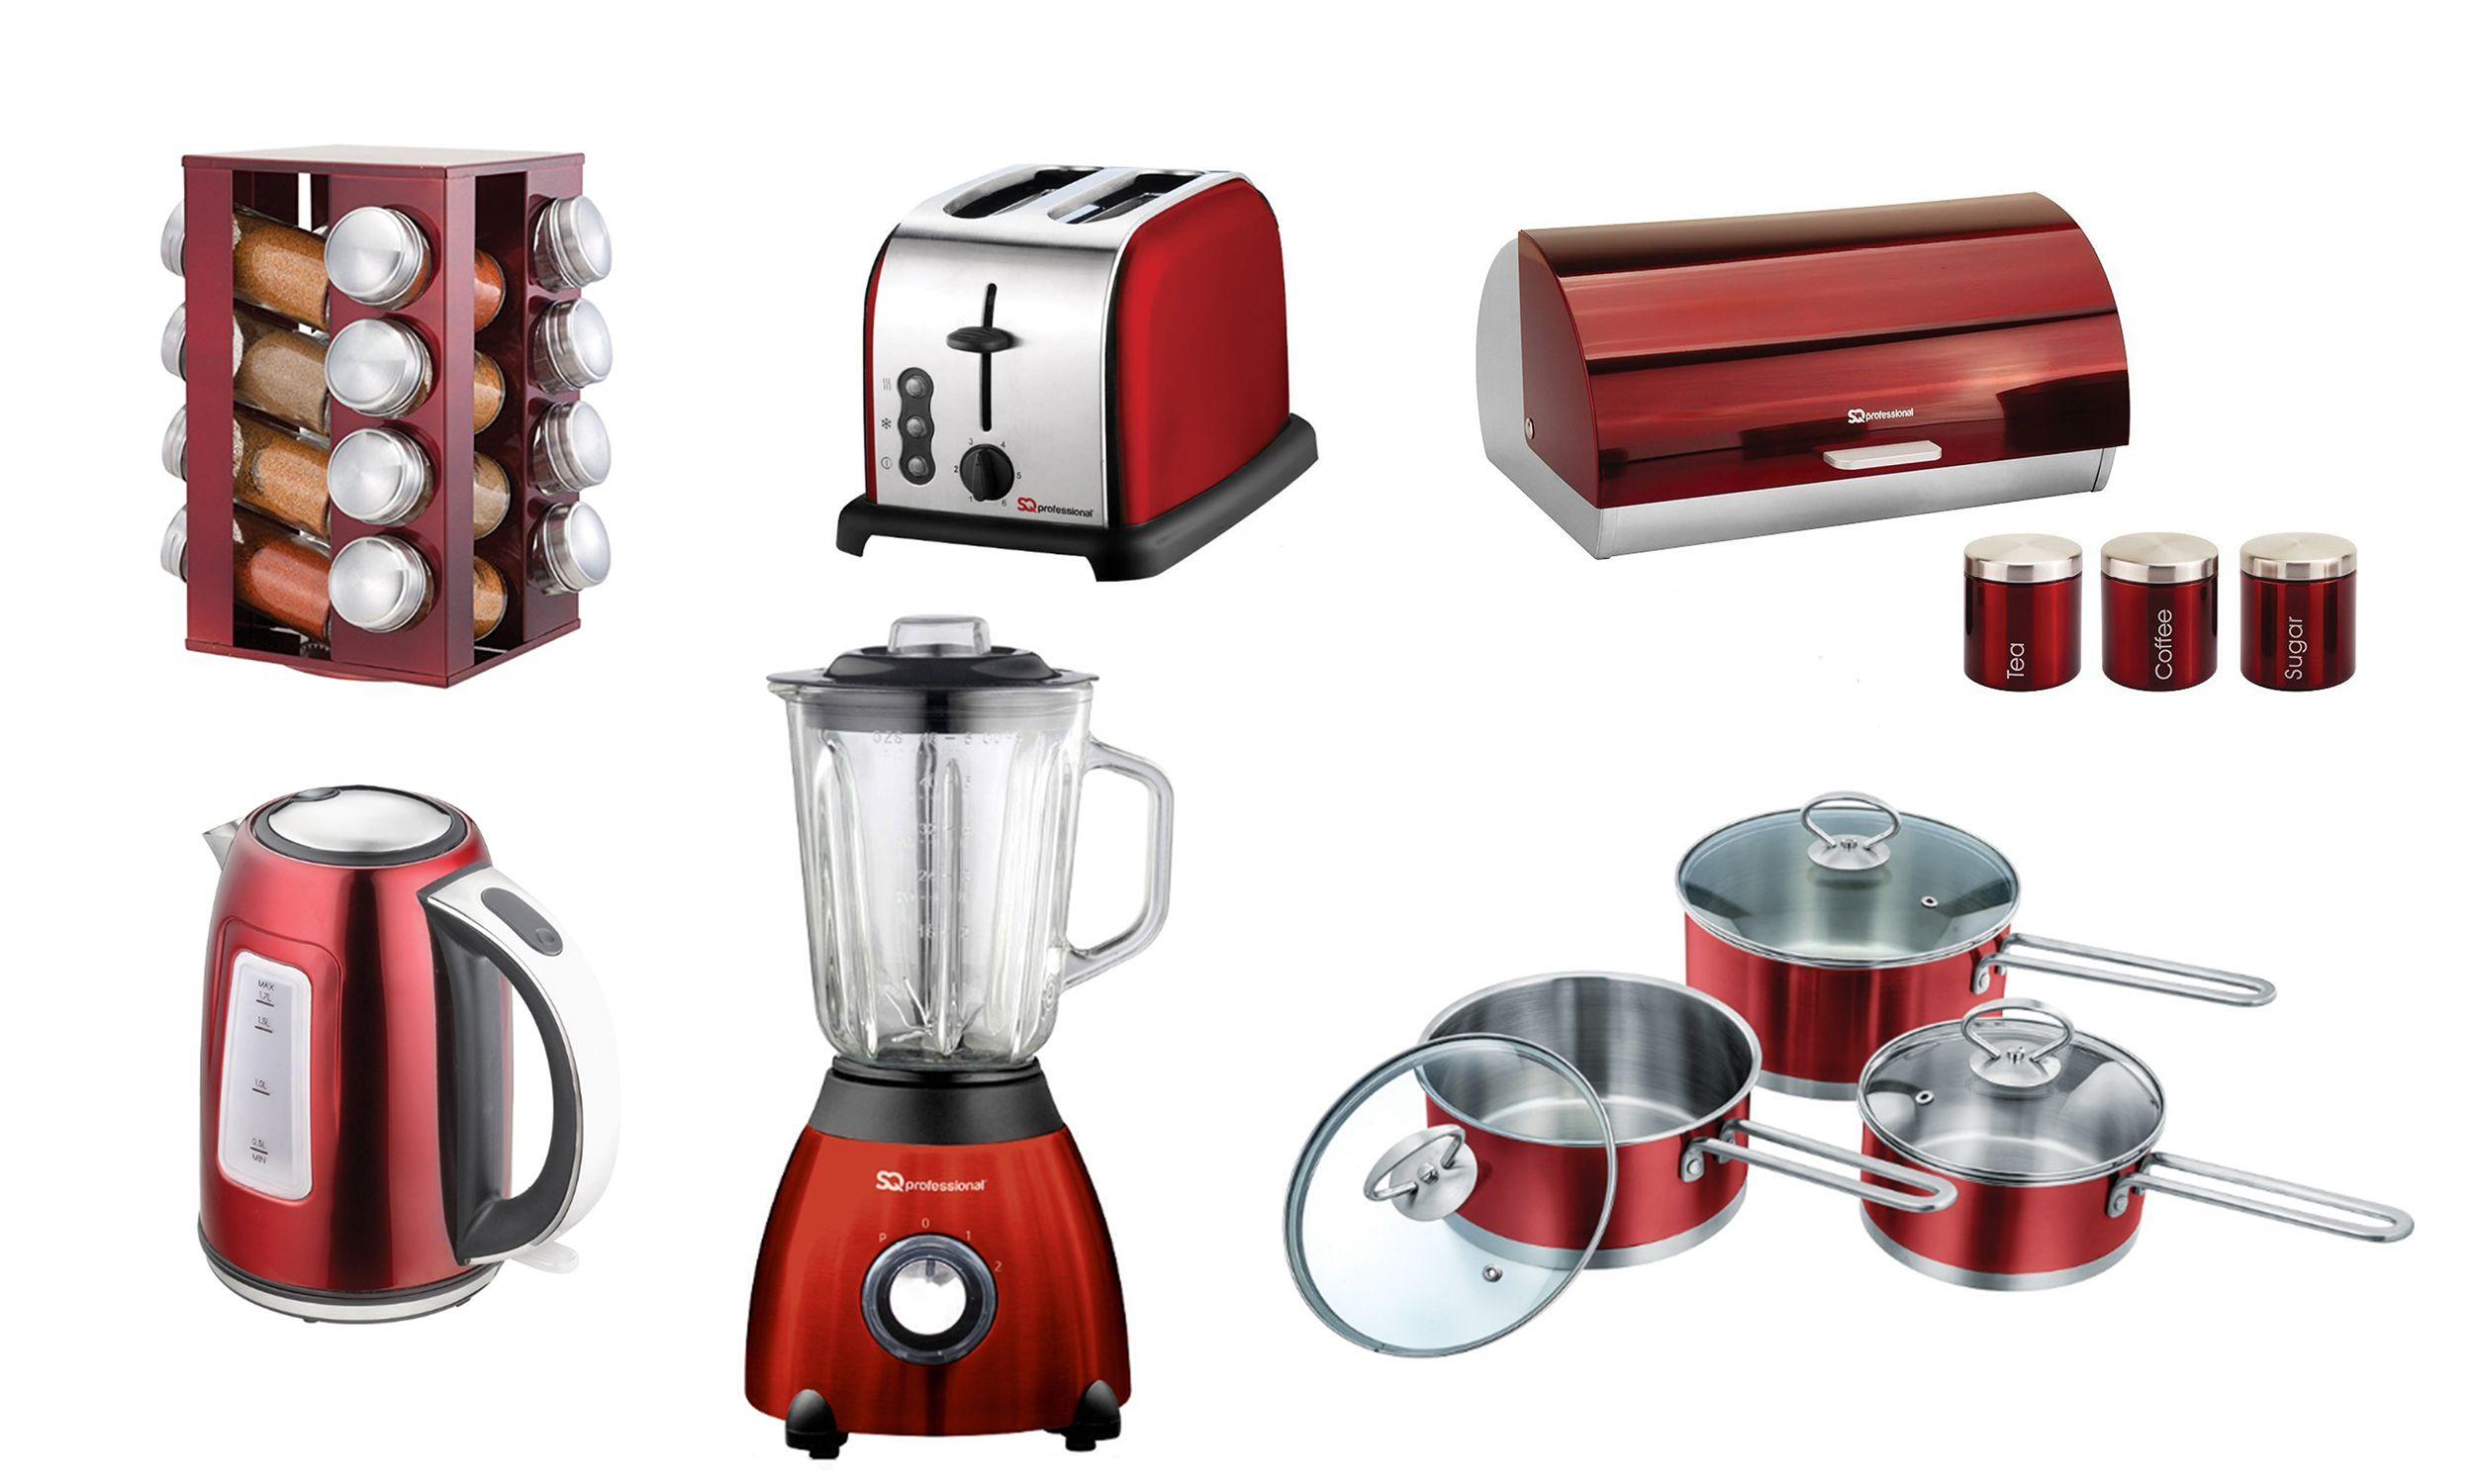 red kitchen appliances sets kitchen appliances sets in 2019 red kitchen appliances kitchen on kitchen appliances id=59540